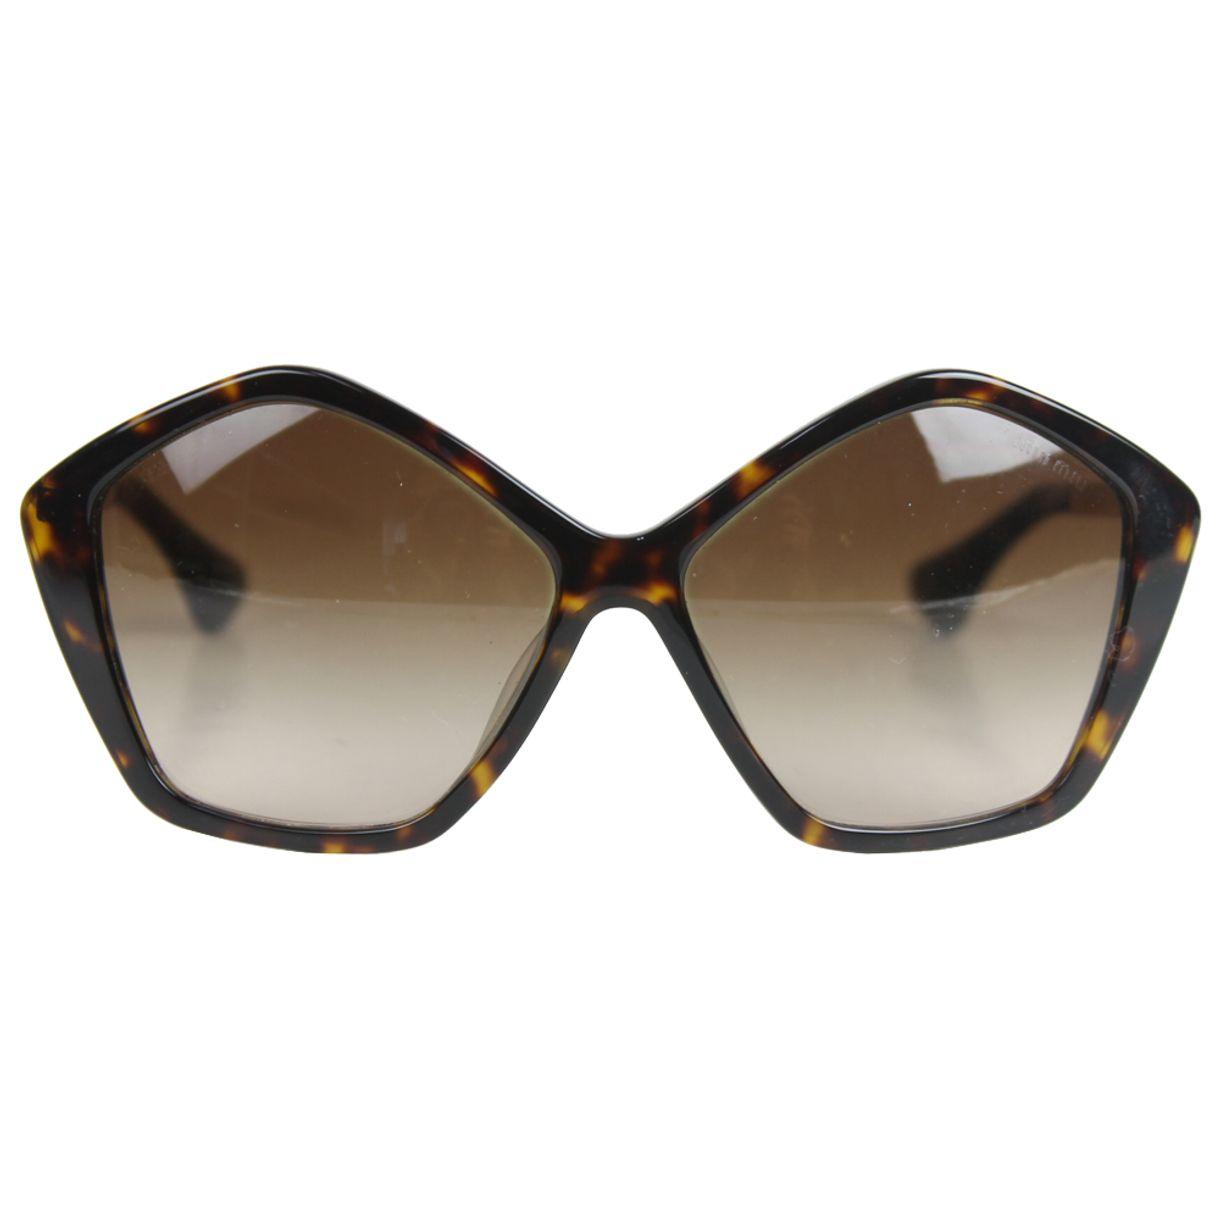 60388-oculos-miu-miu-tartarug-pentagonal-1